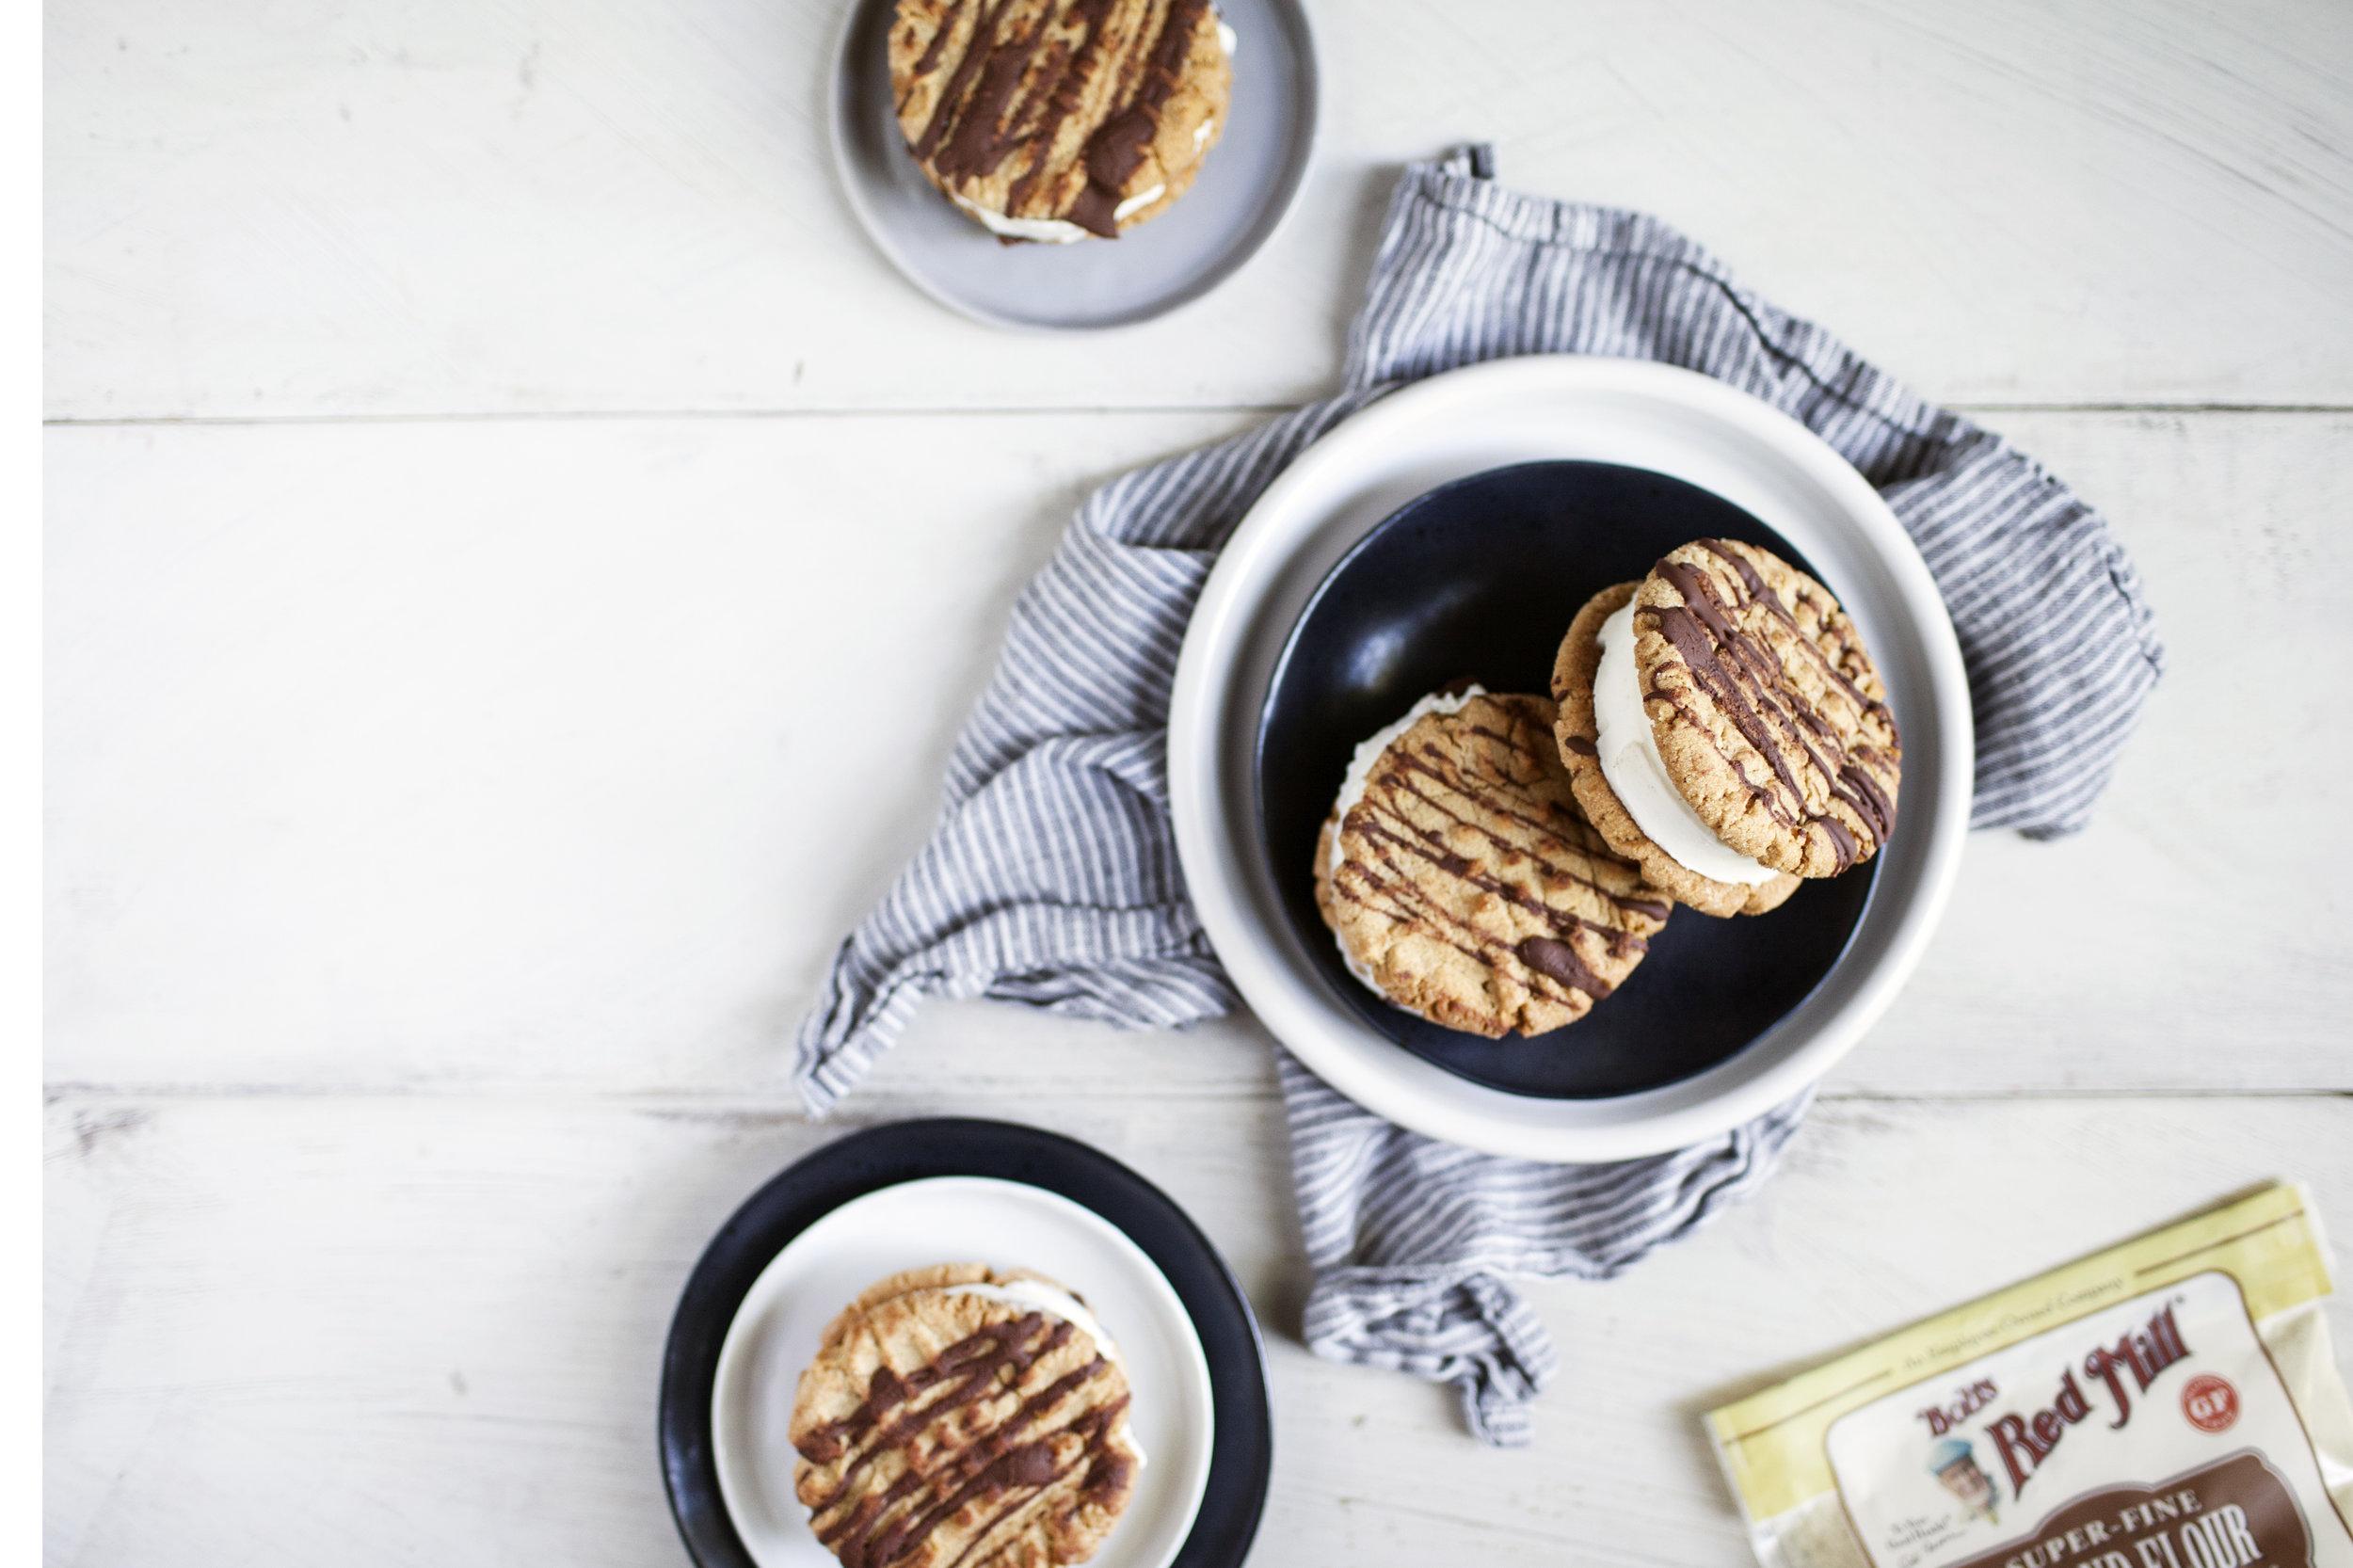 almond ice cream sandwich viiii.jpg